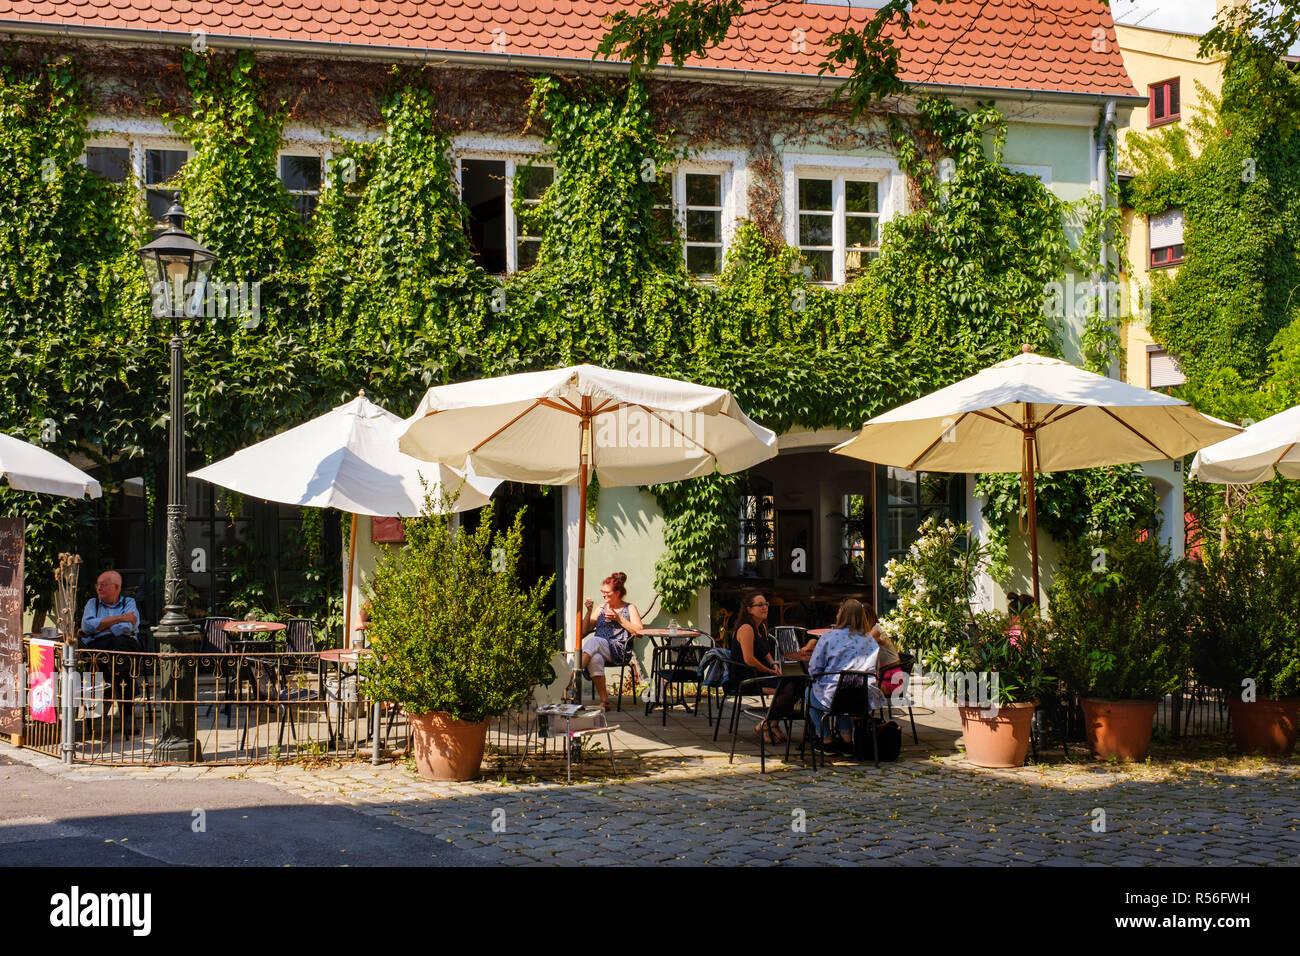 Greened Café Rufus, Lechviertel, Augsburg, Swabia, Bavaria, Germany - Stock Image